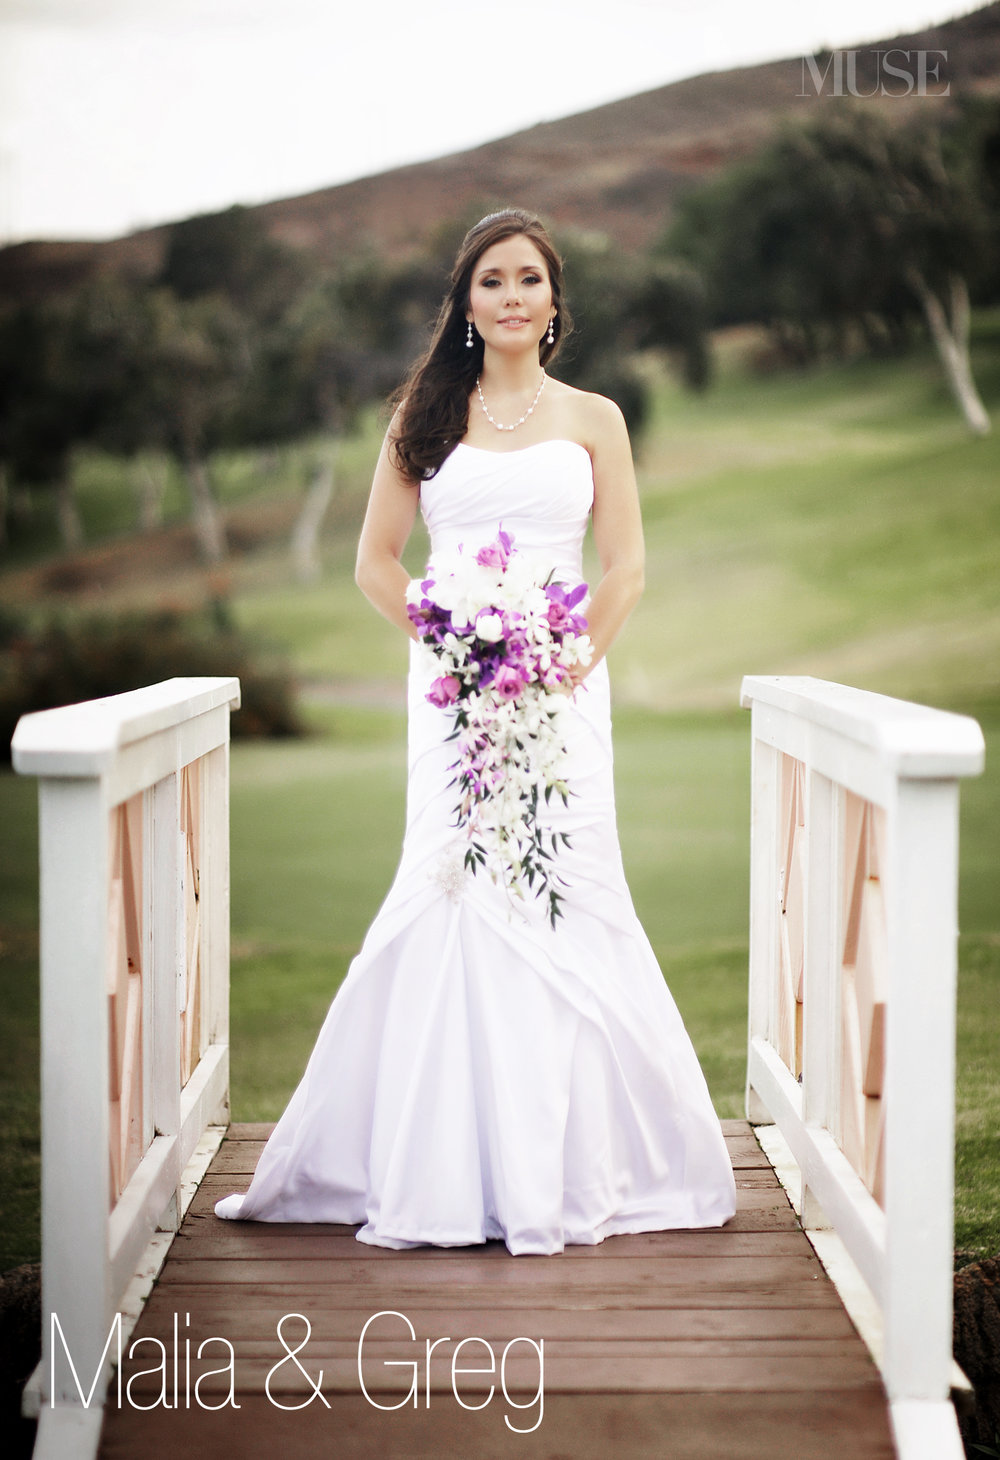 MUSE Bride Lookbook - Brides . Malia